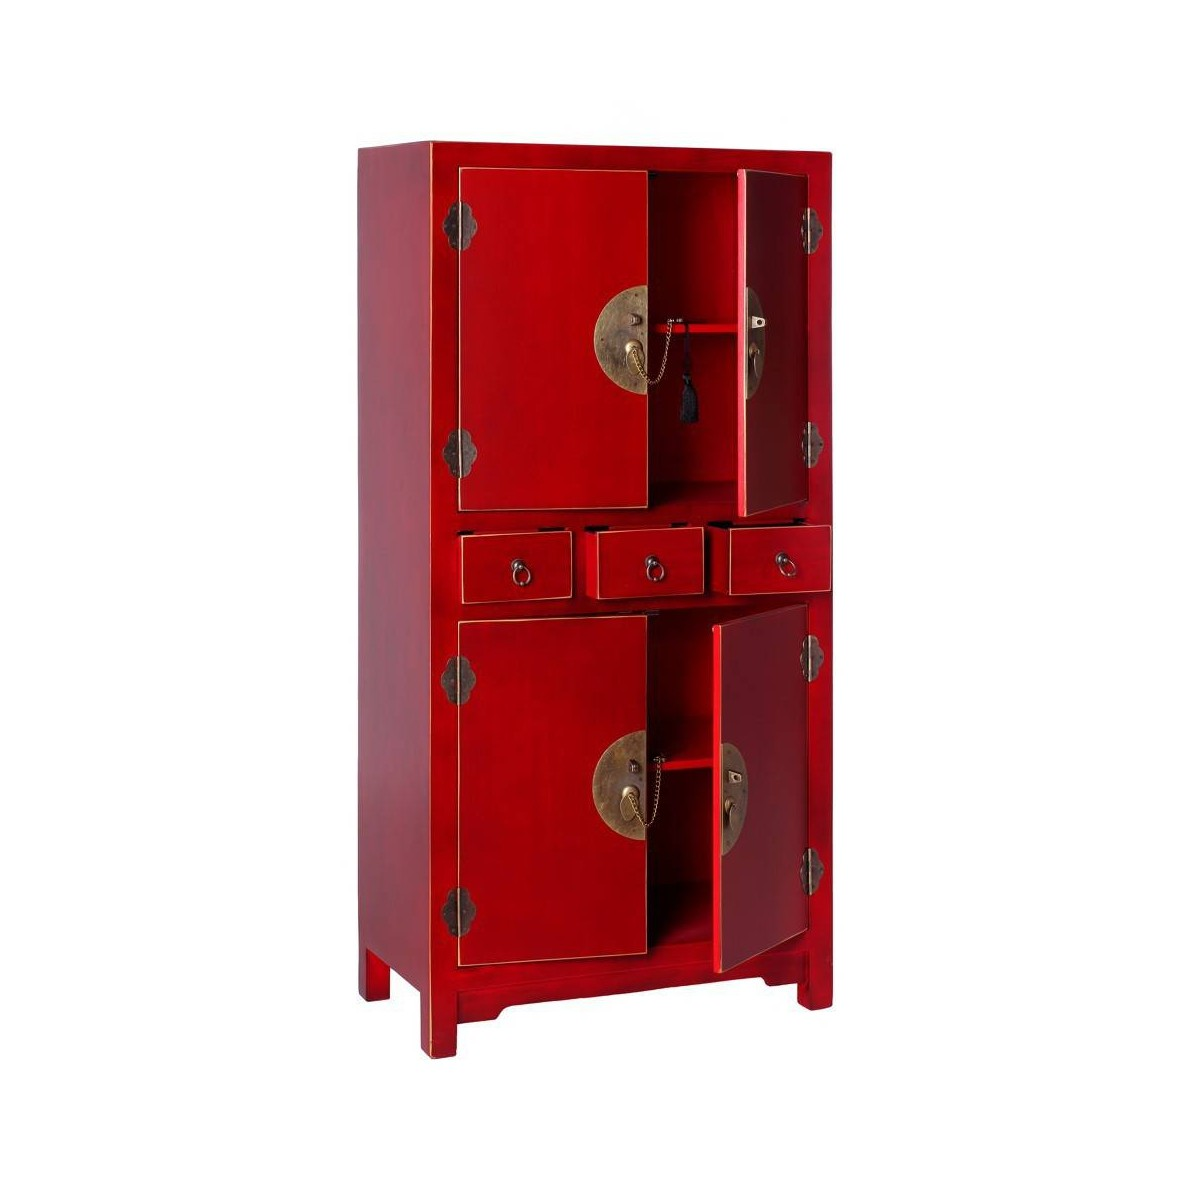 Mueble auxiliar japo rojo 4 puertas 3 cajones madera for Mueble 4 puertas